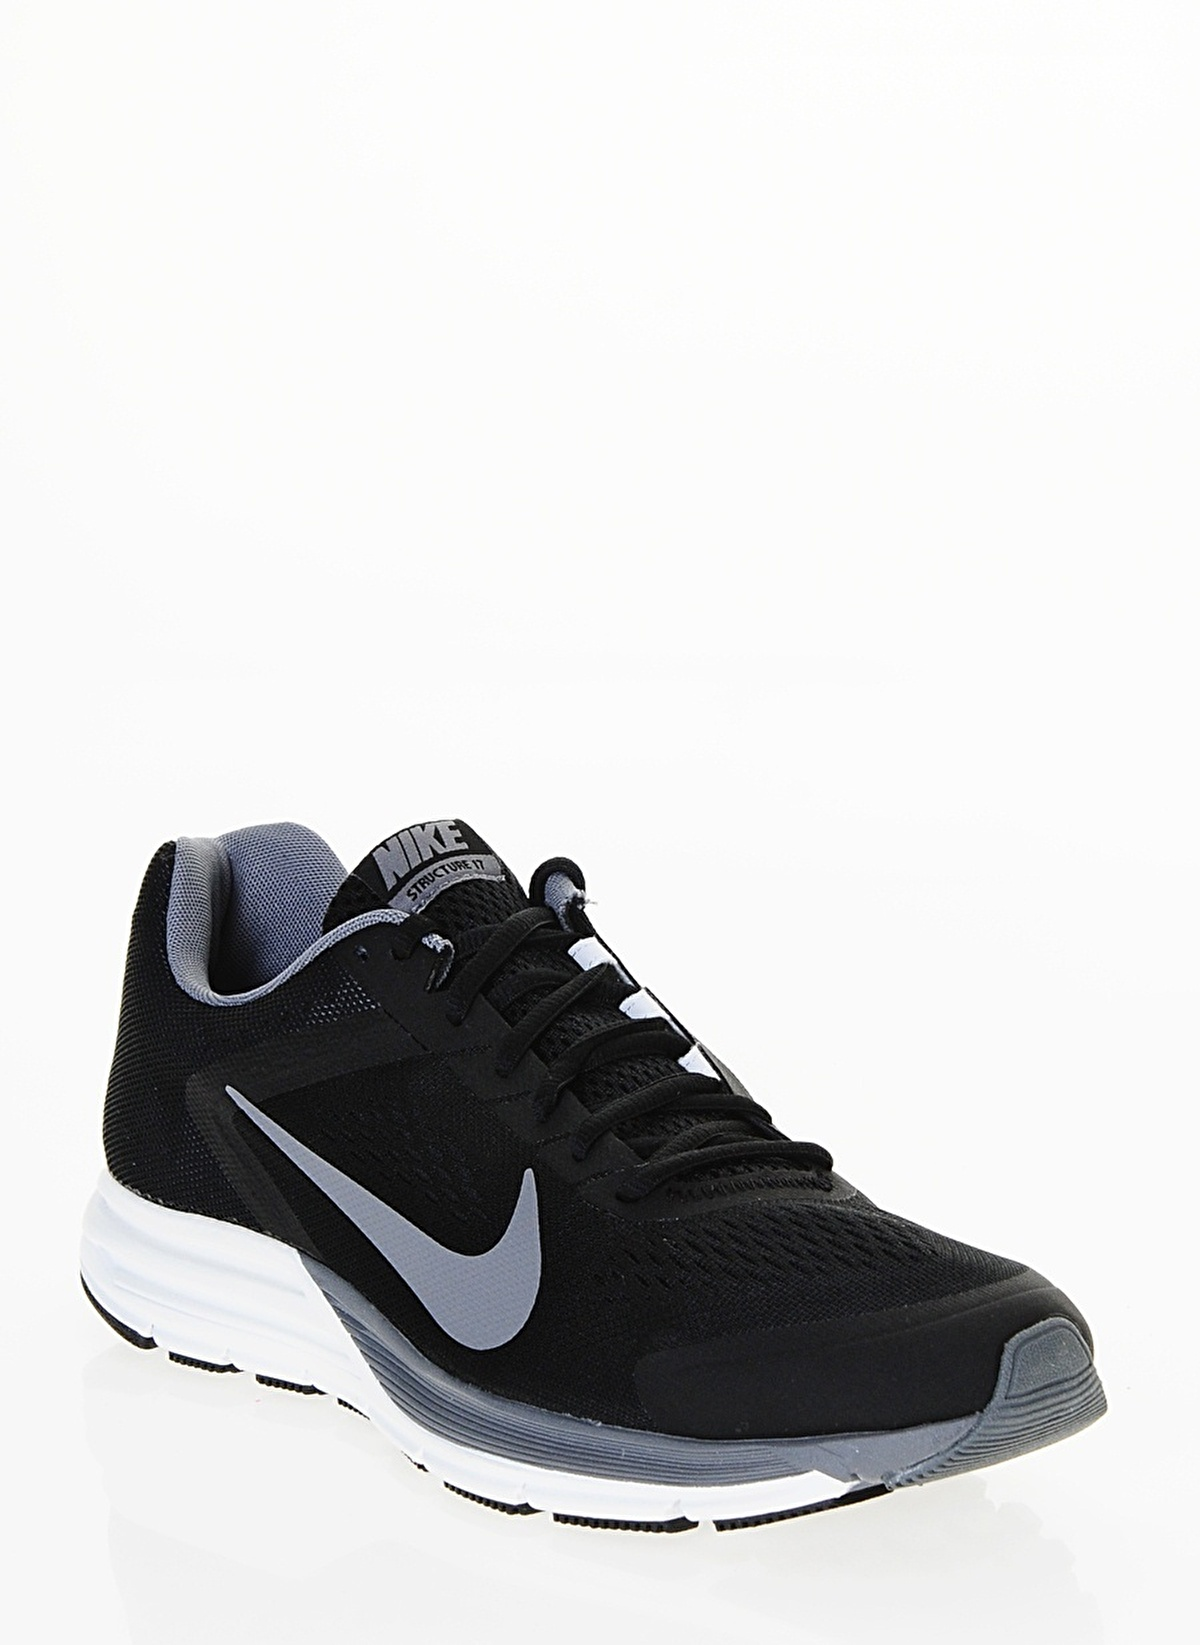 uk availability 47527 f2958 615587-010-Nike-Zoom-Structure+-17